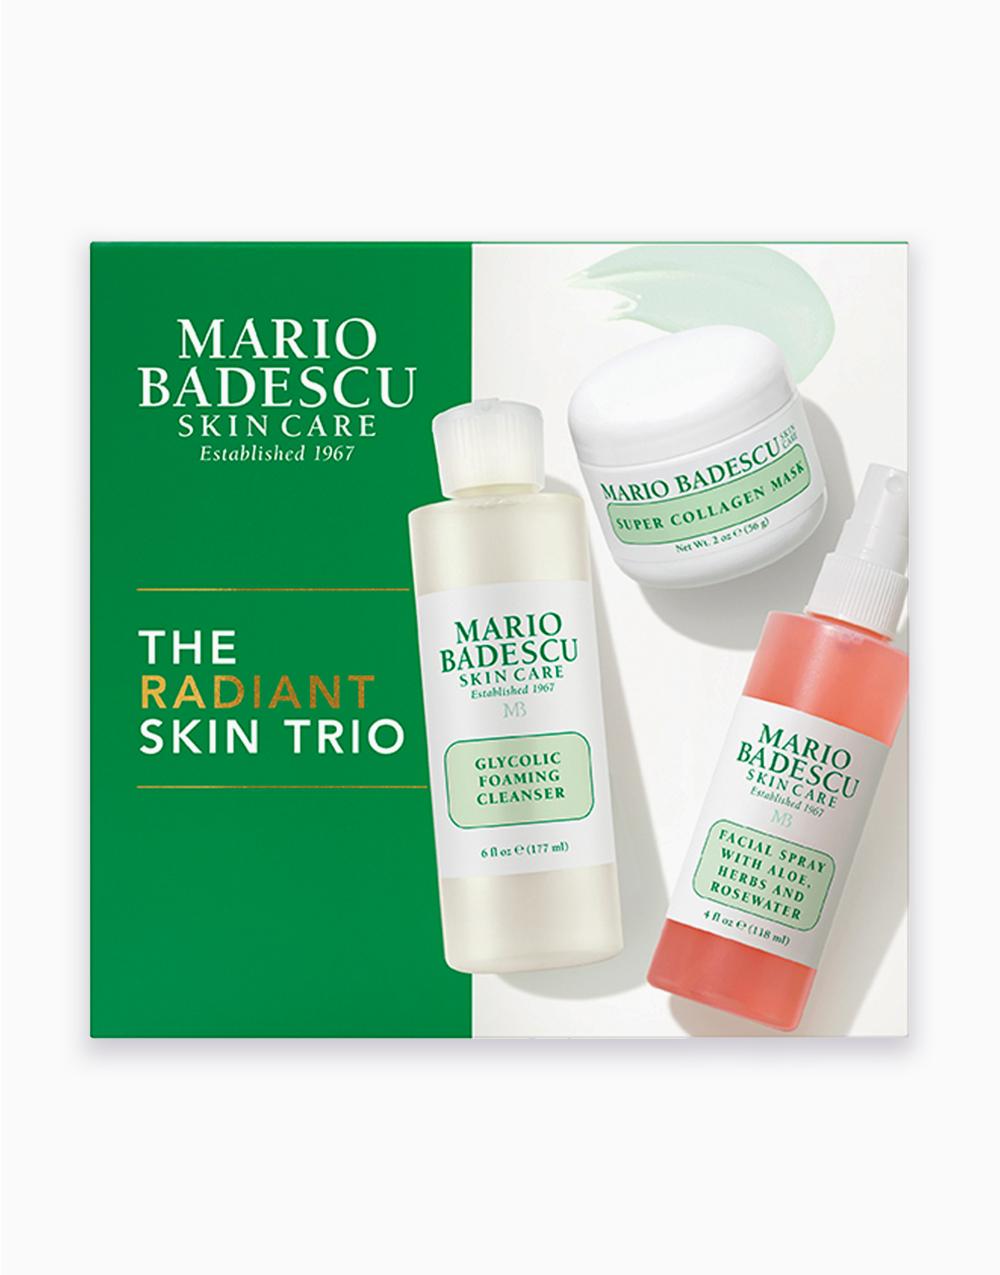 The Radiant Skin Trio by Mario Badescu